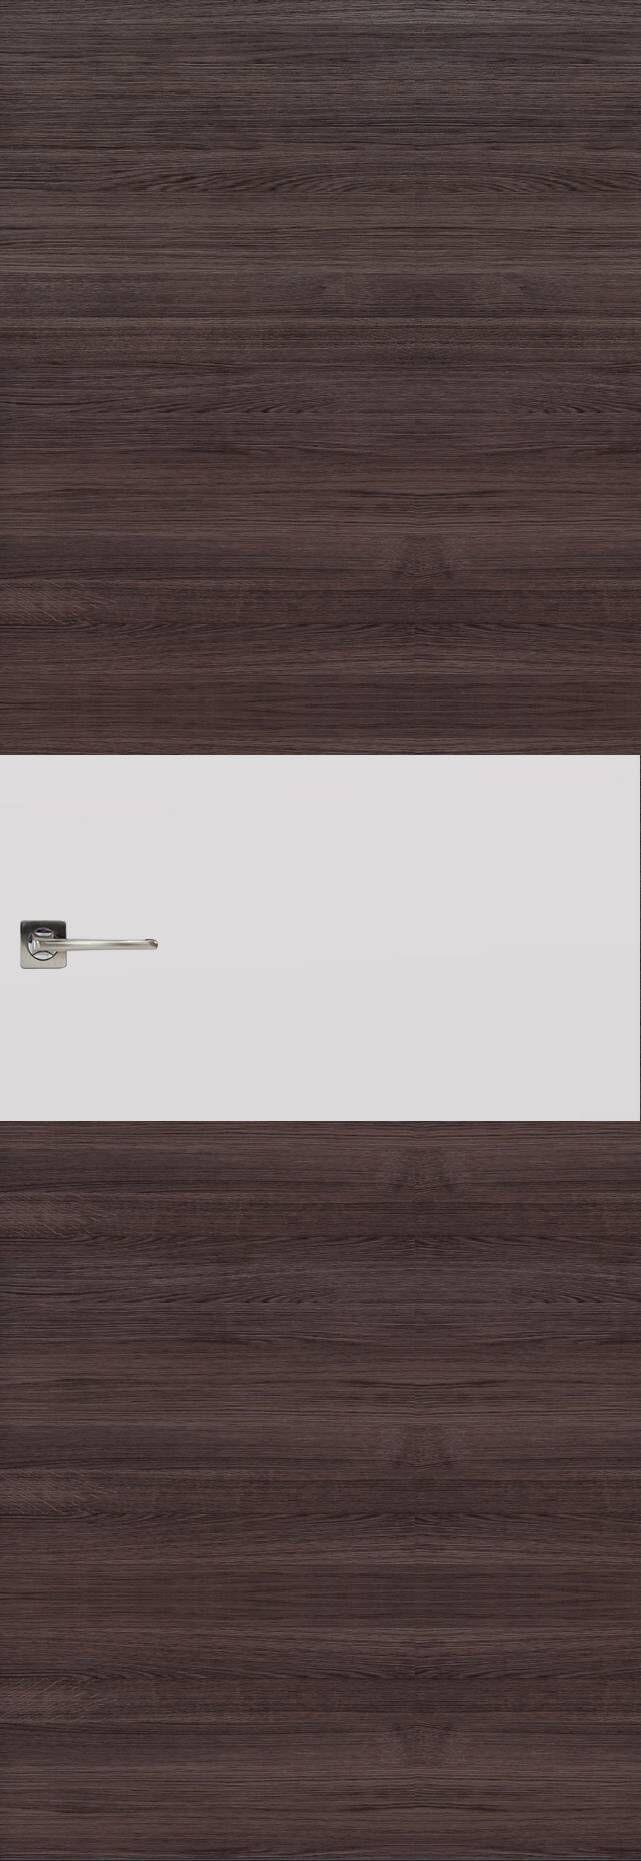 Tivoli Е-4 Невидимка цвет - Венге Нуар Без стекла (ДГ)